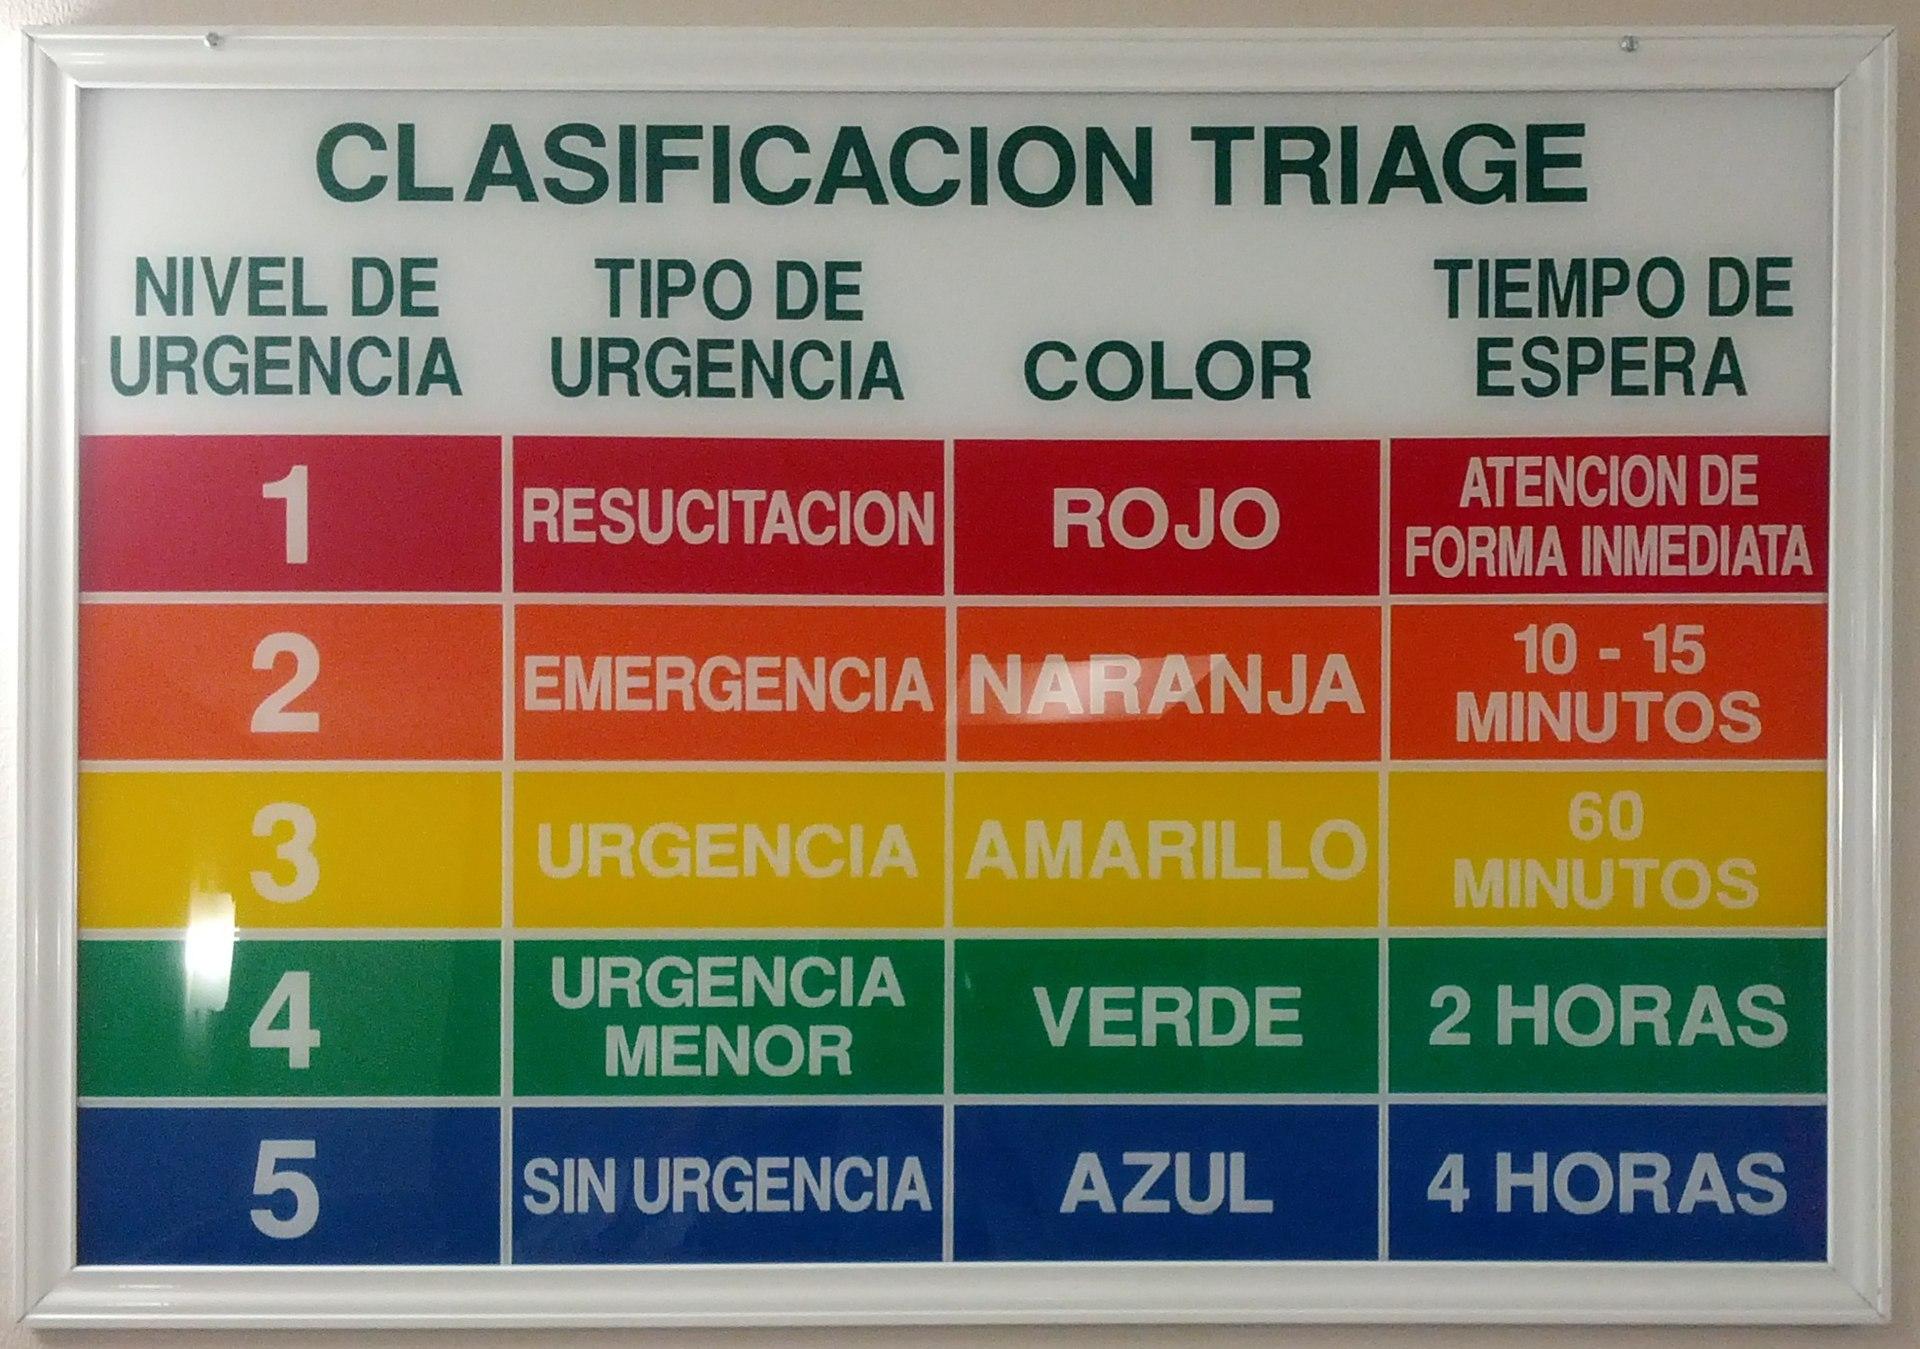 Mass General Hospital Emergency Room Wait Time